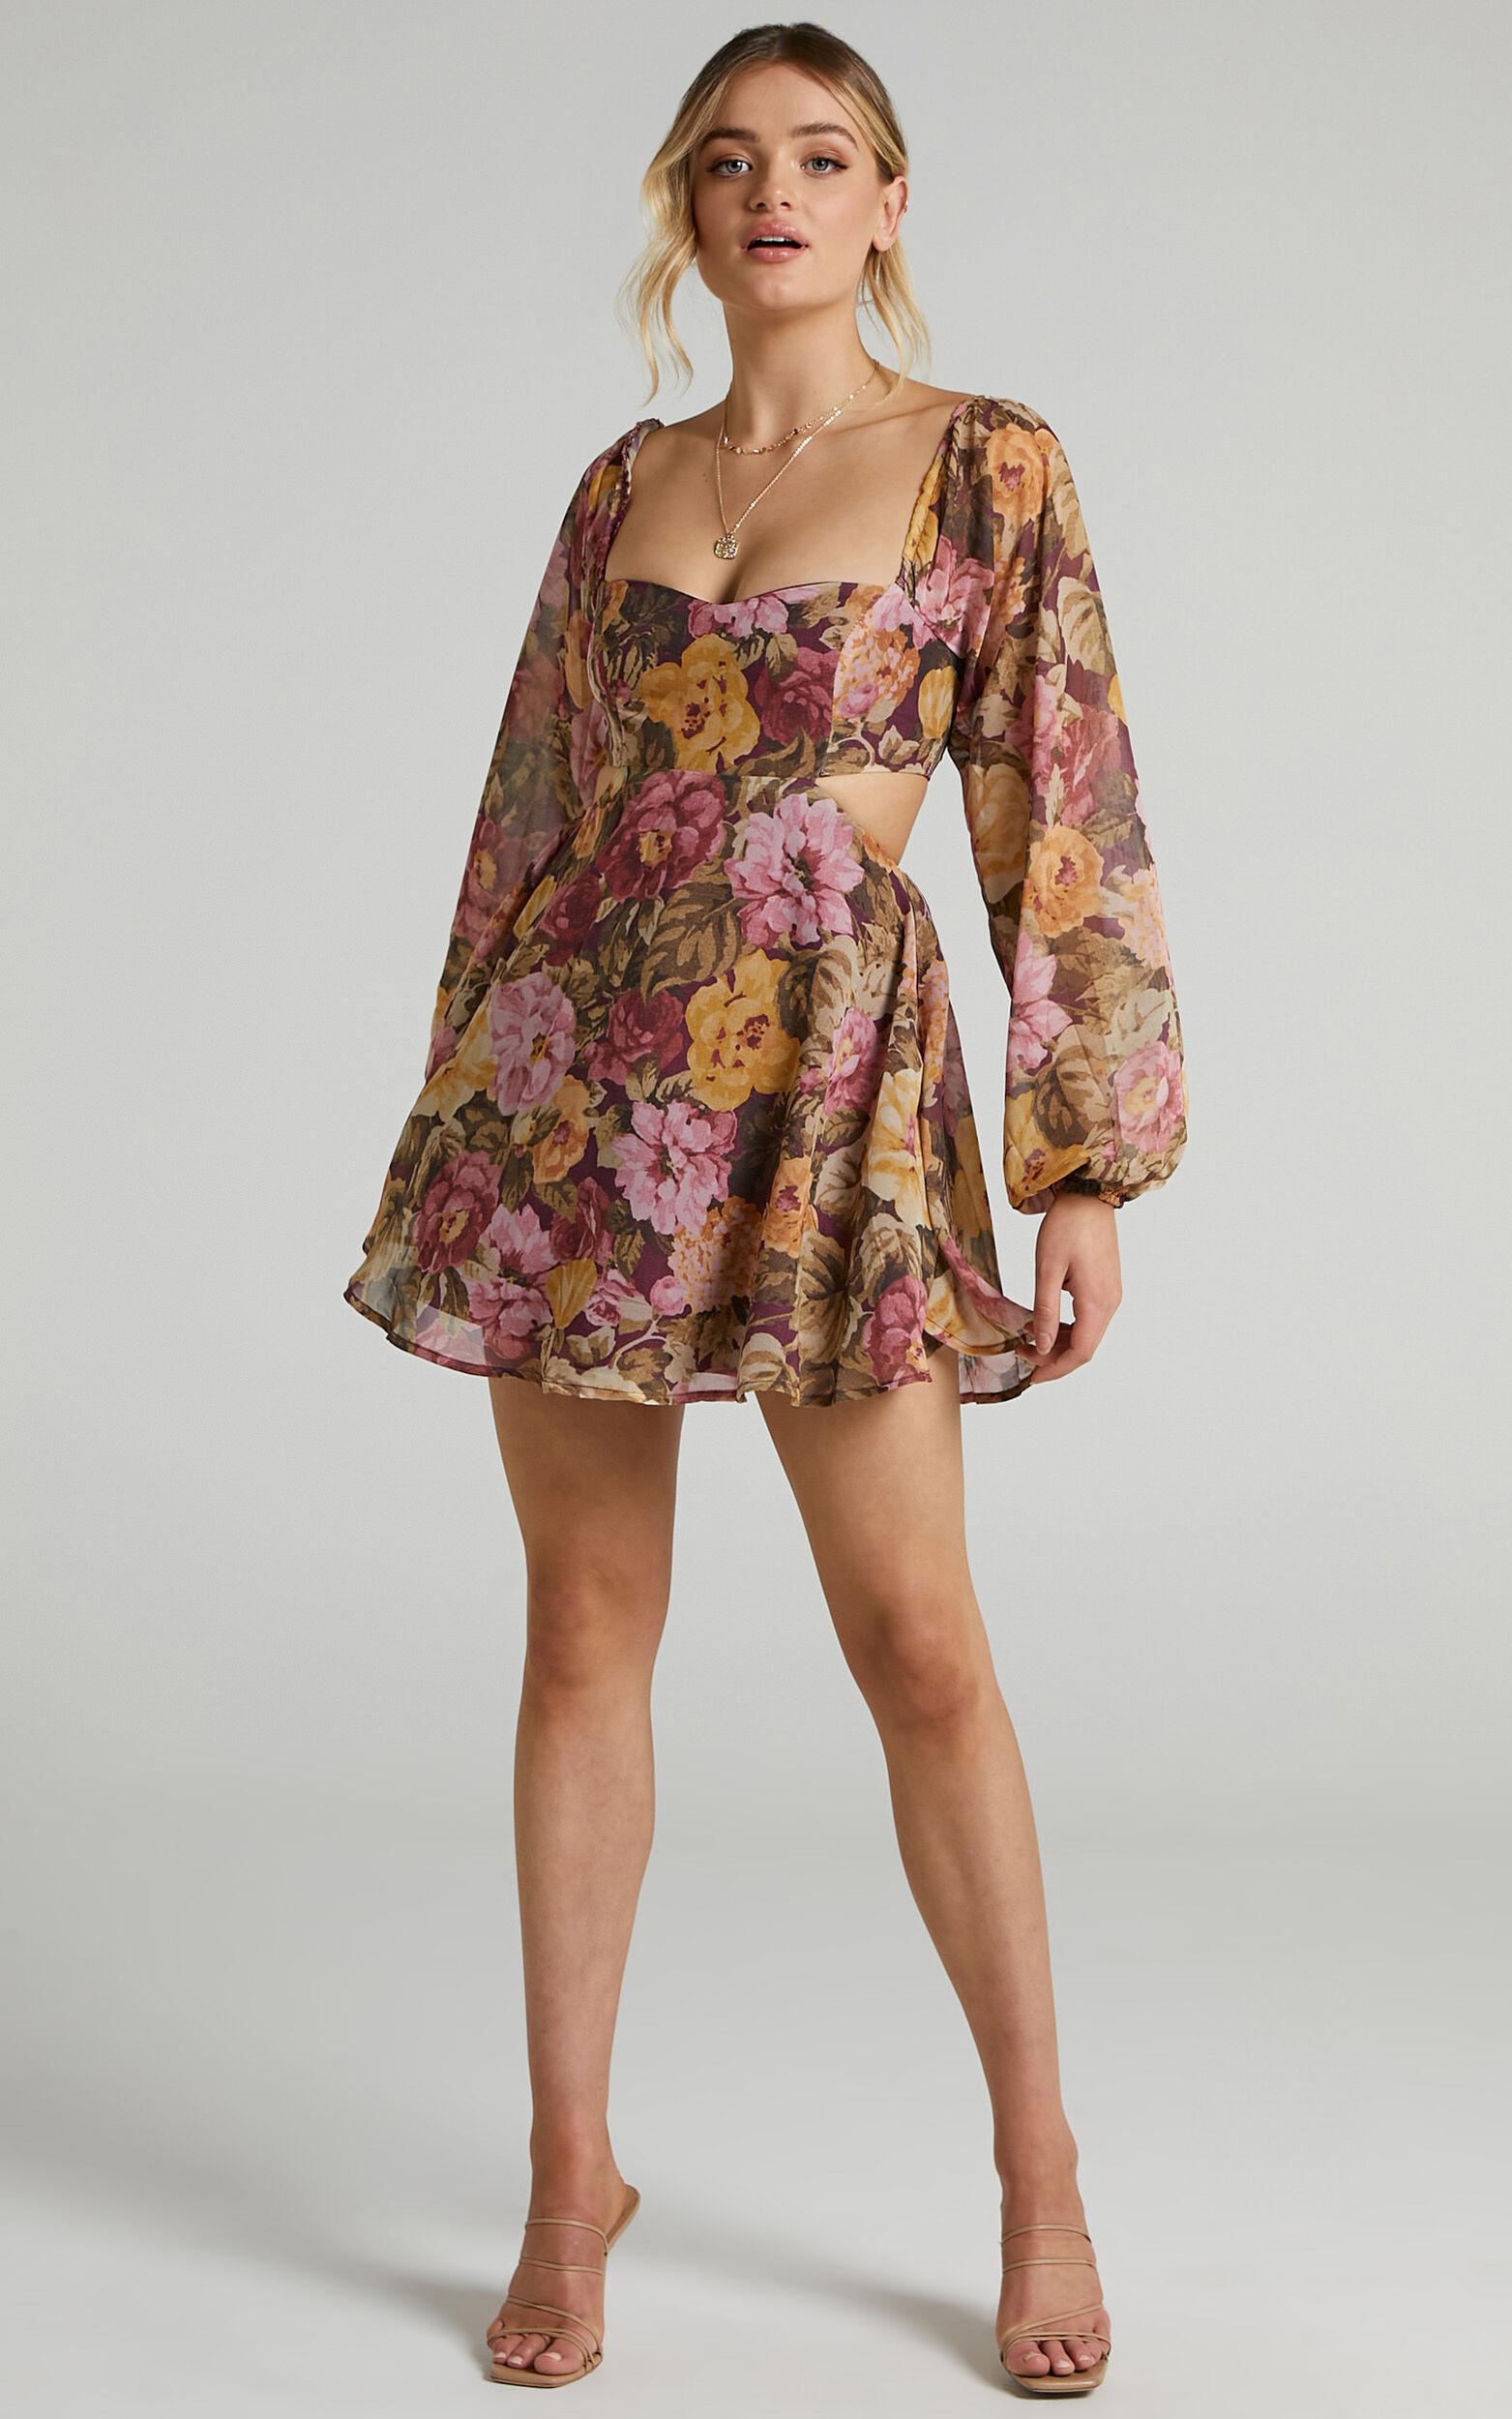 Ebonee Dress in Classic Floral - 06, PNK1, super-hi-res image number null